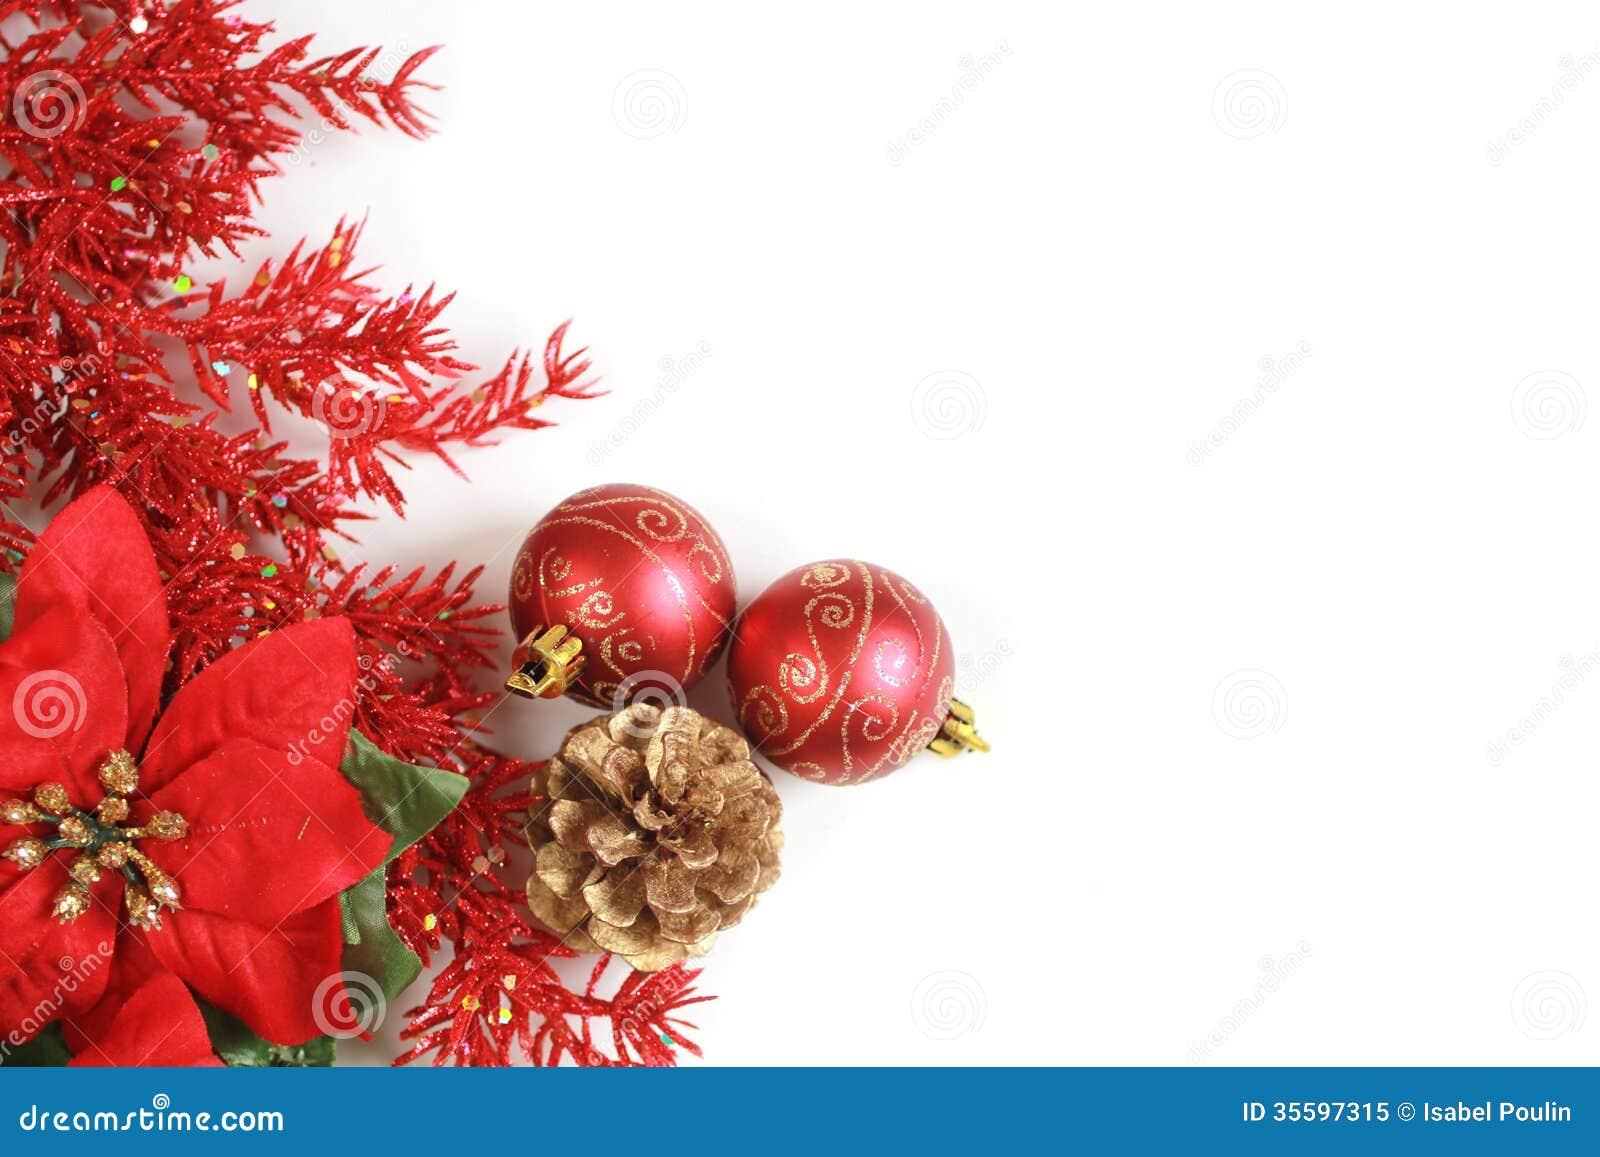 Merry Christmas Royalty Free Stock Photo Image 35597315